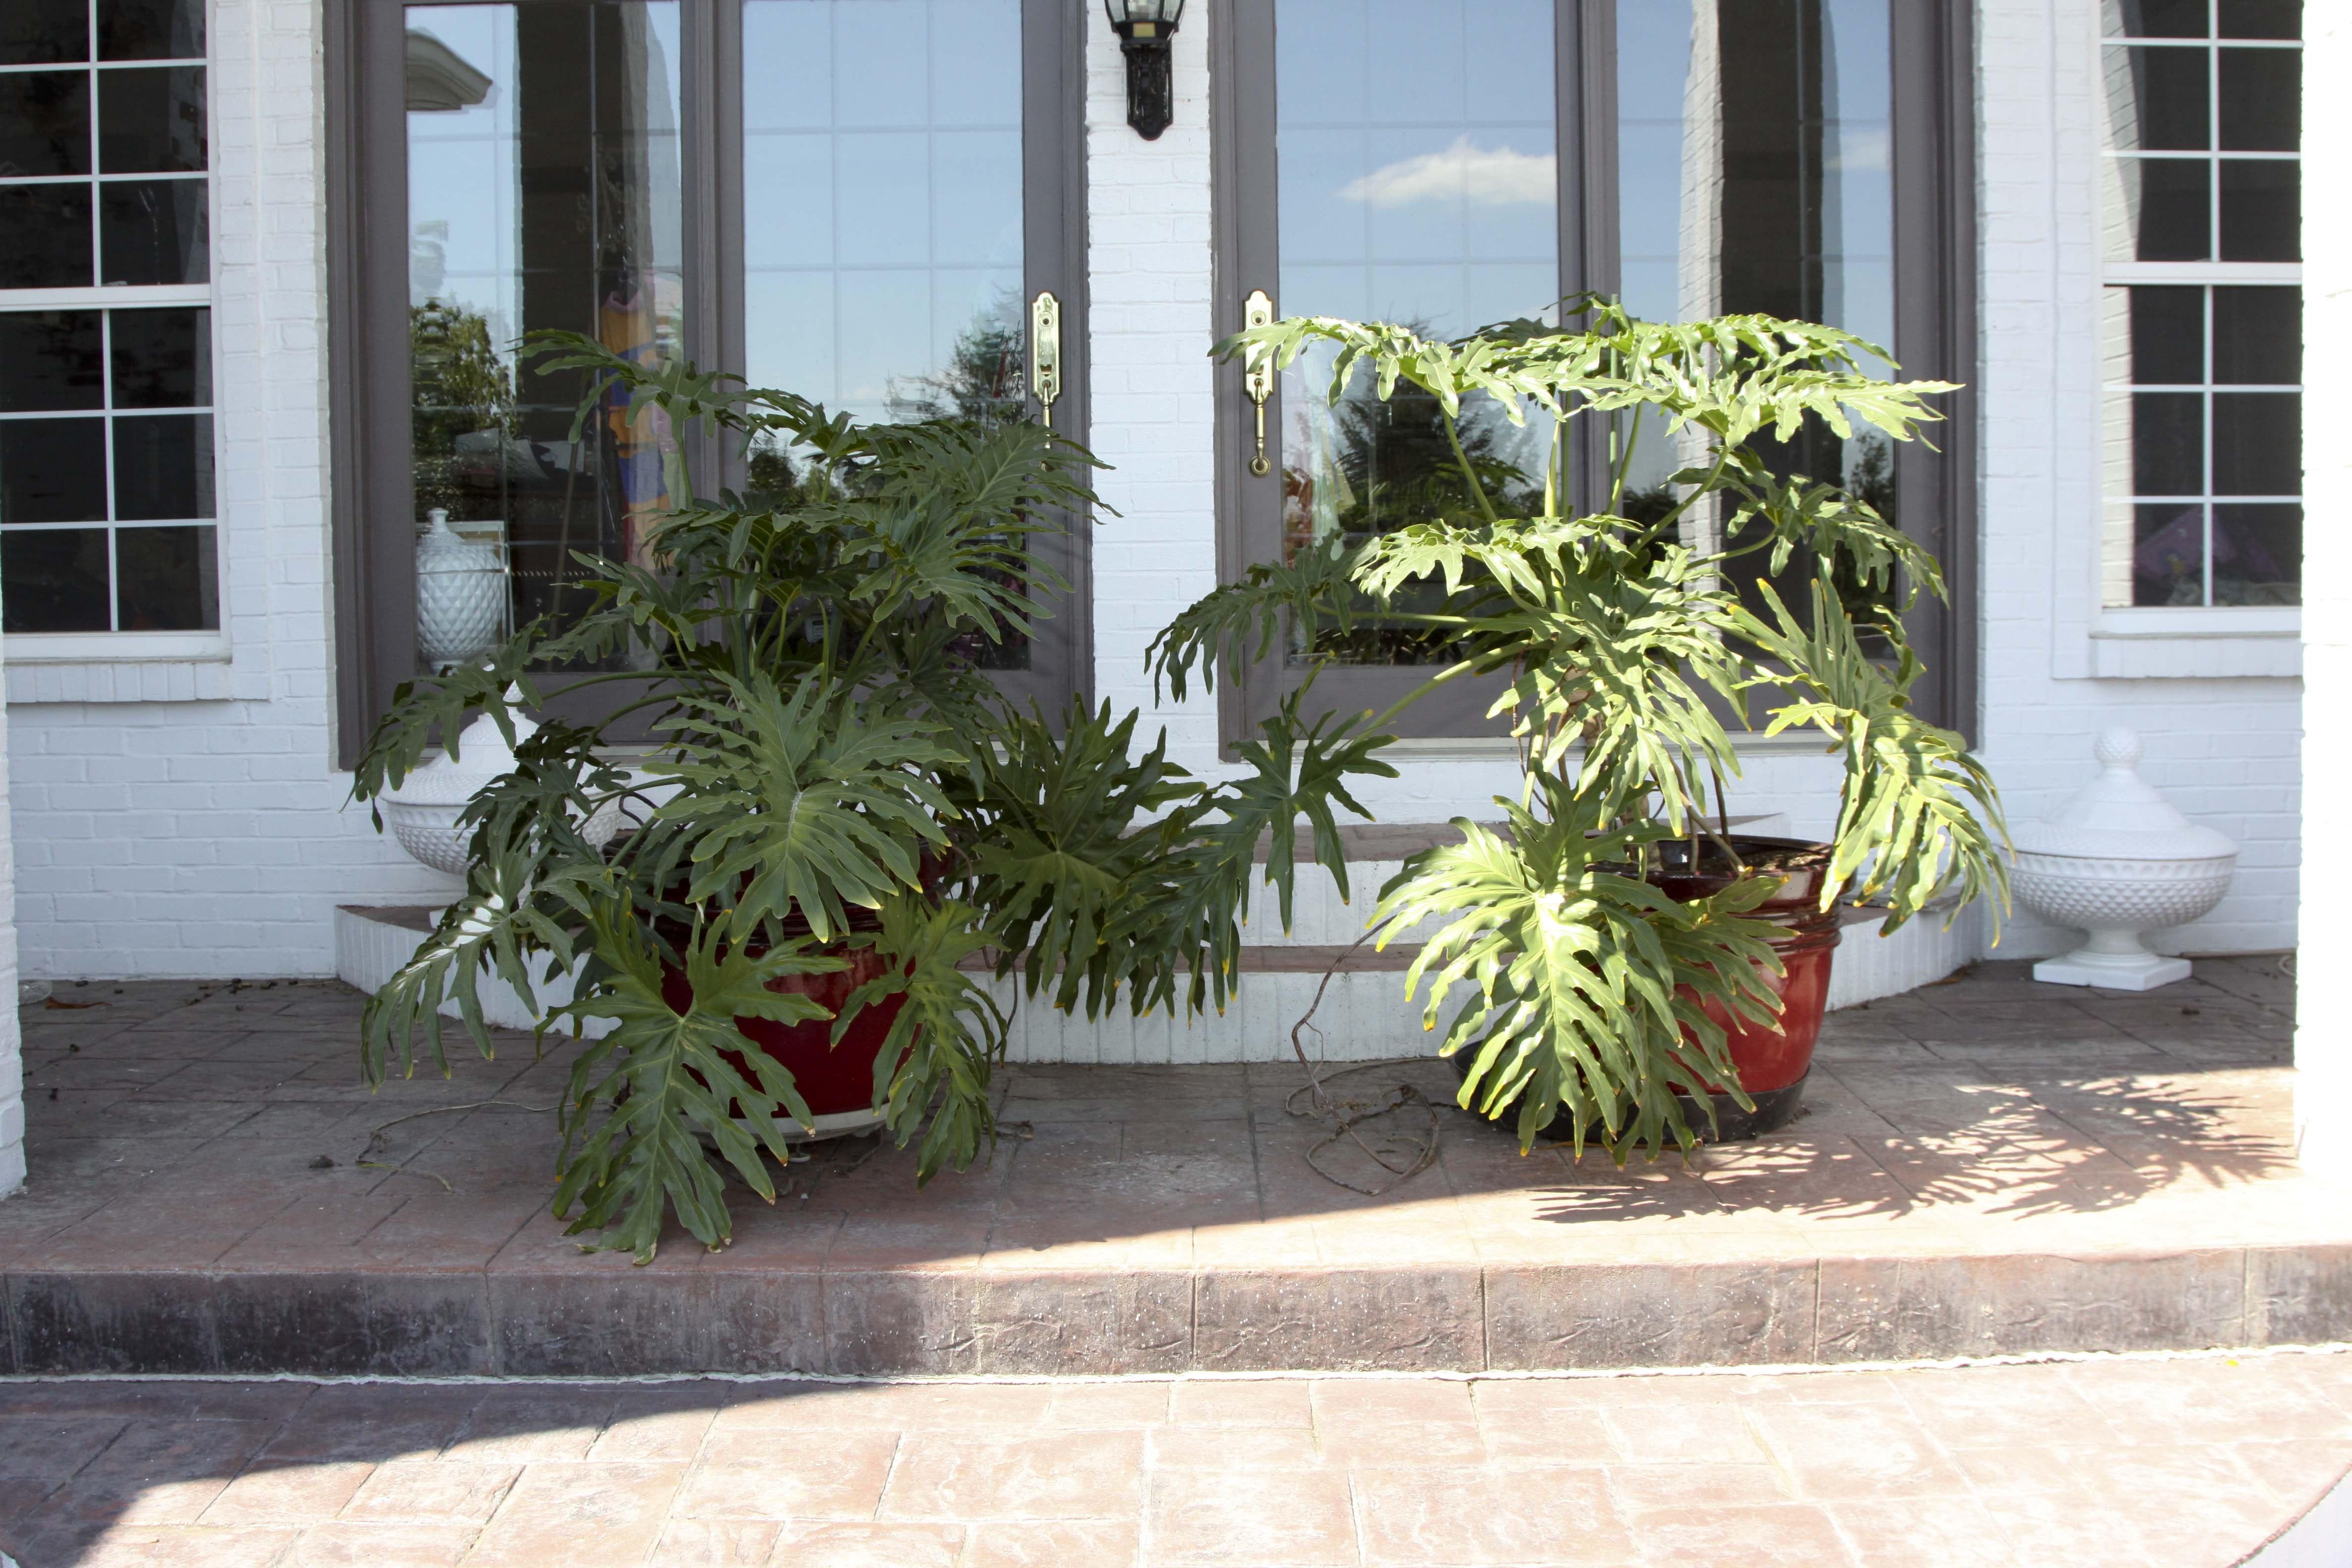 A Pair of Split-Leaf Philadendron Plants